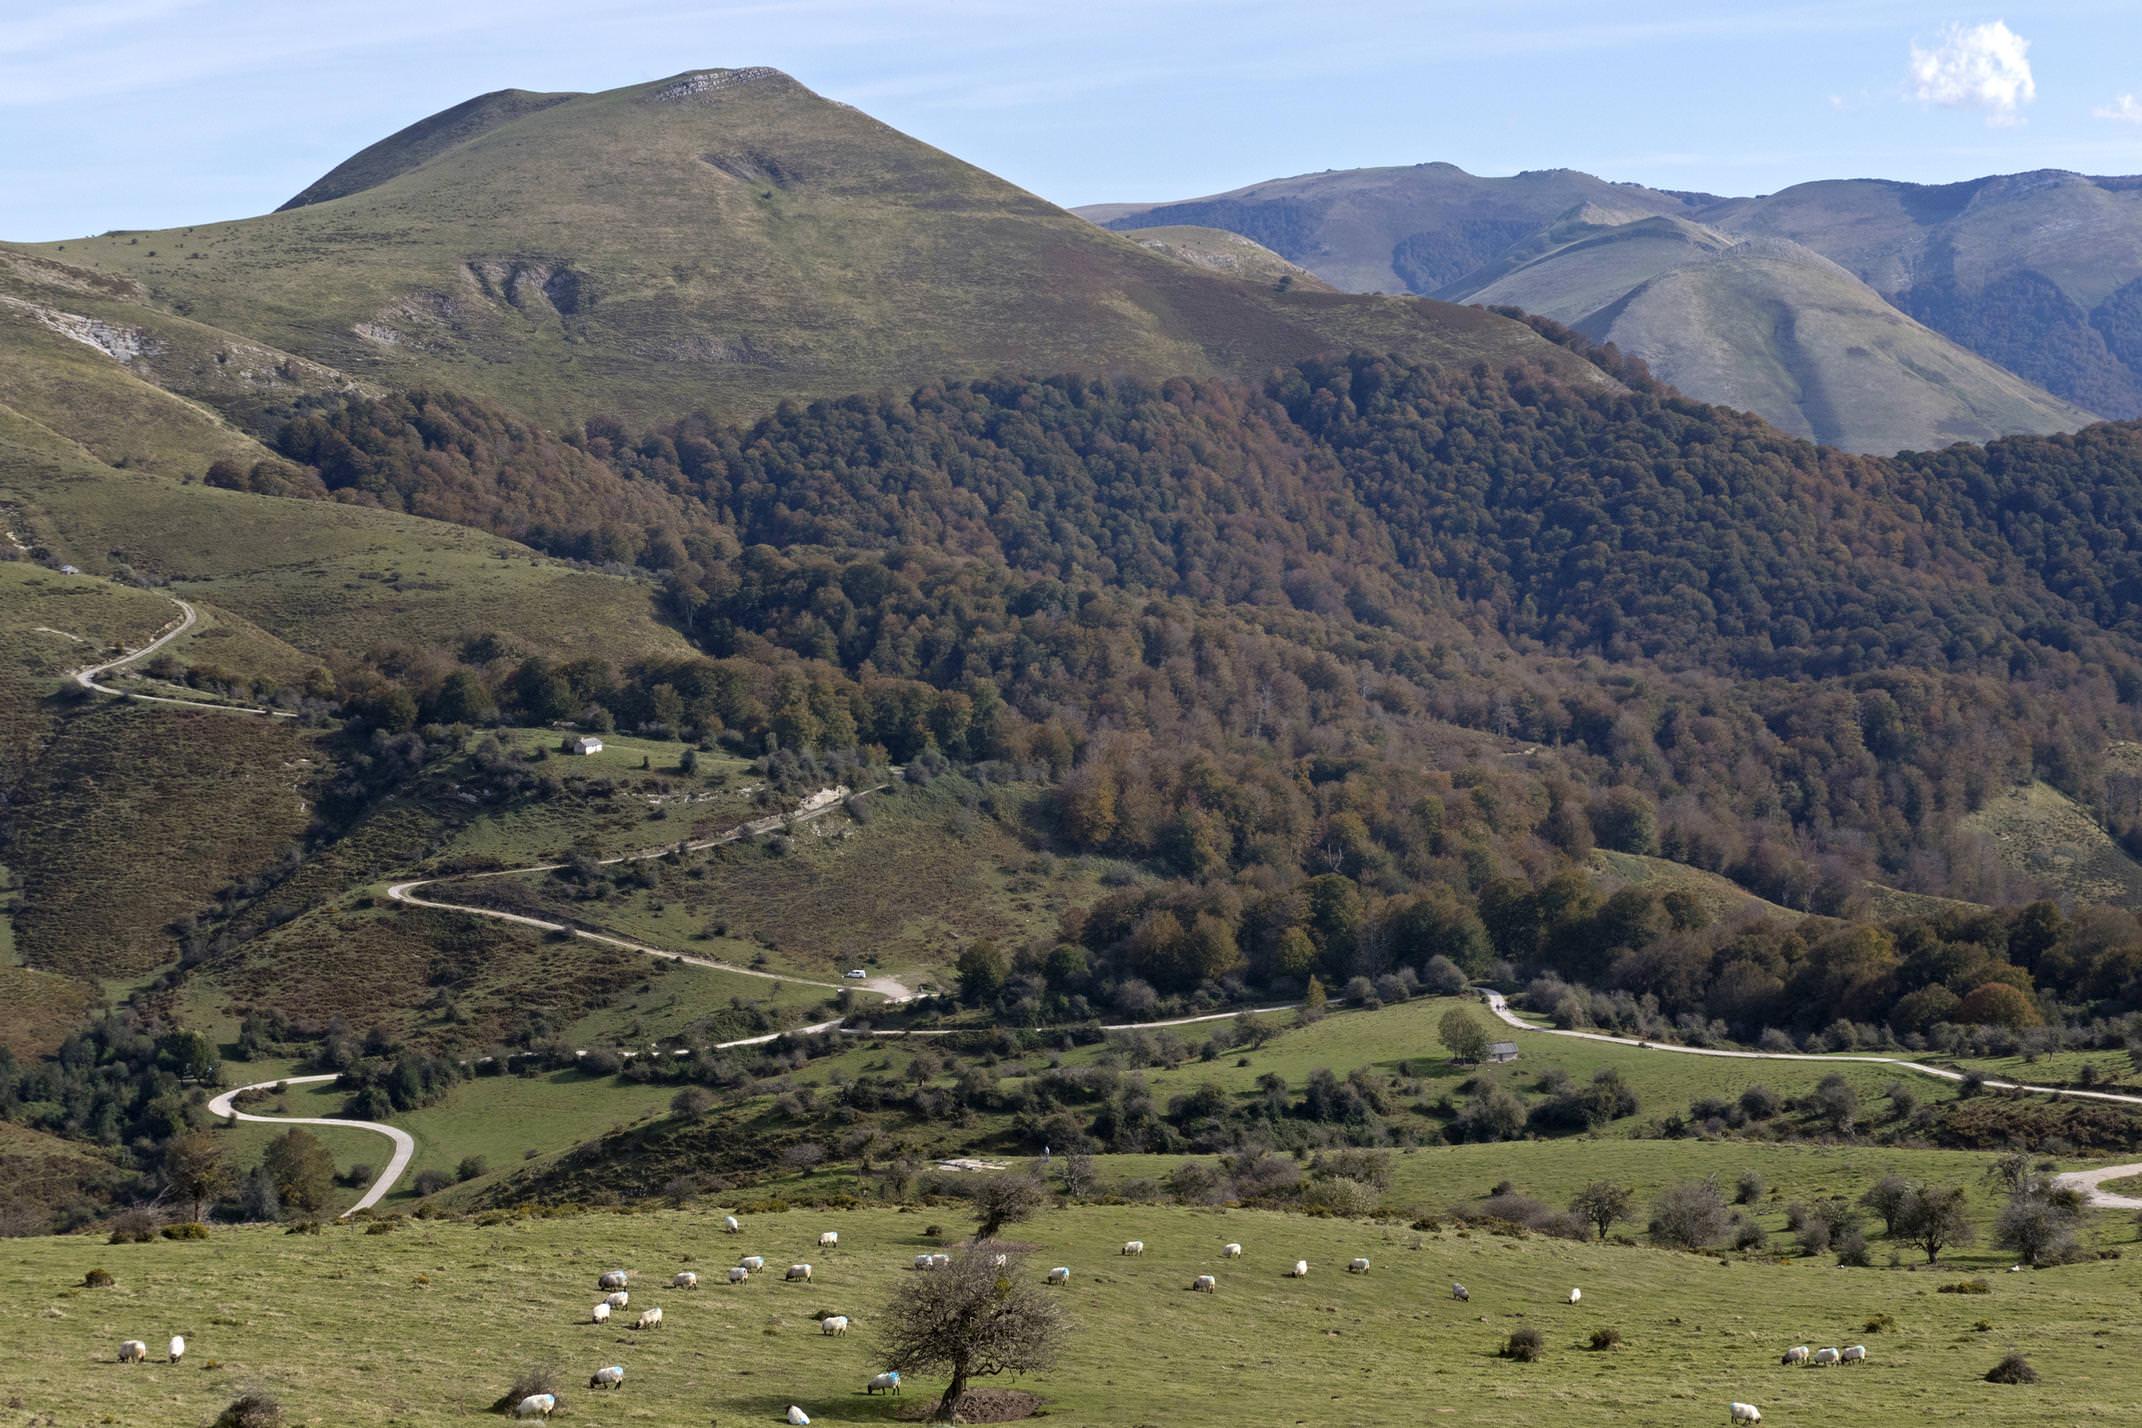 Spain navarre basque pyrenees irati san esteban circuit panorama sheep c diego